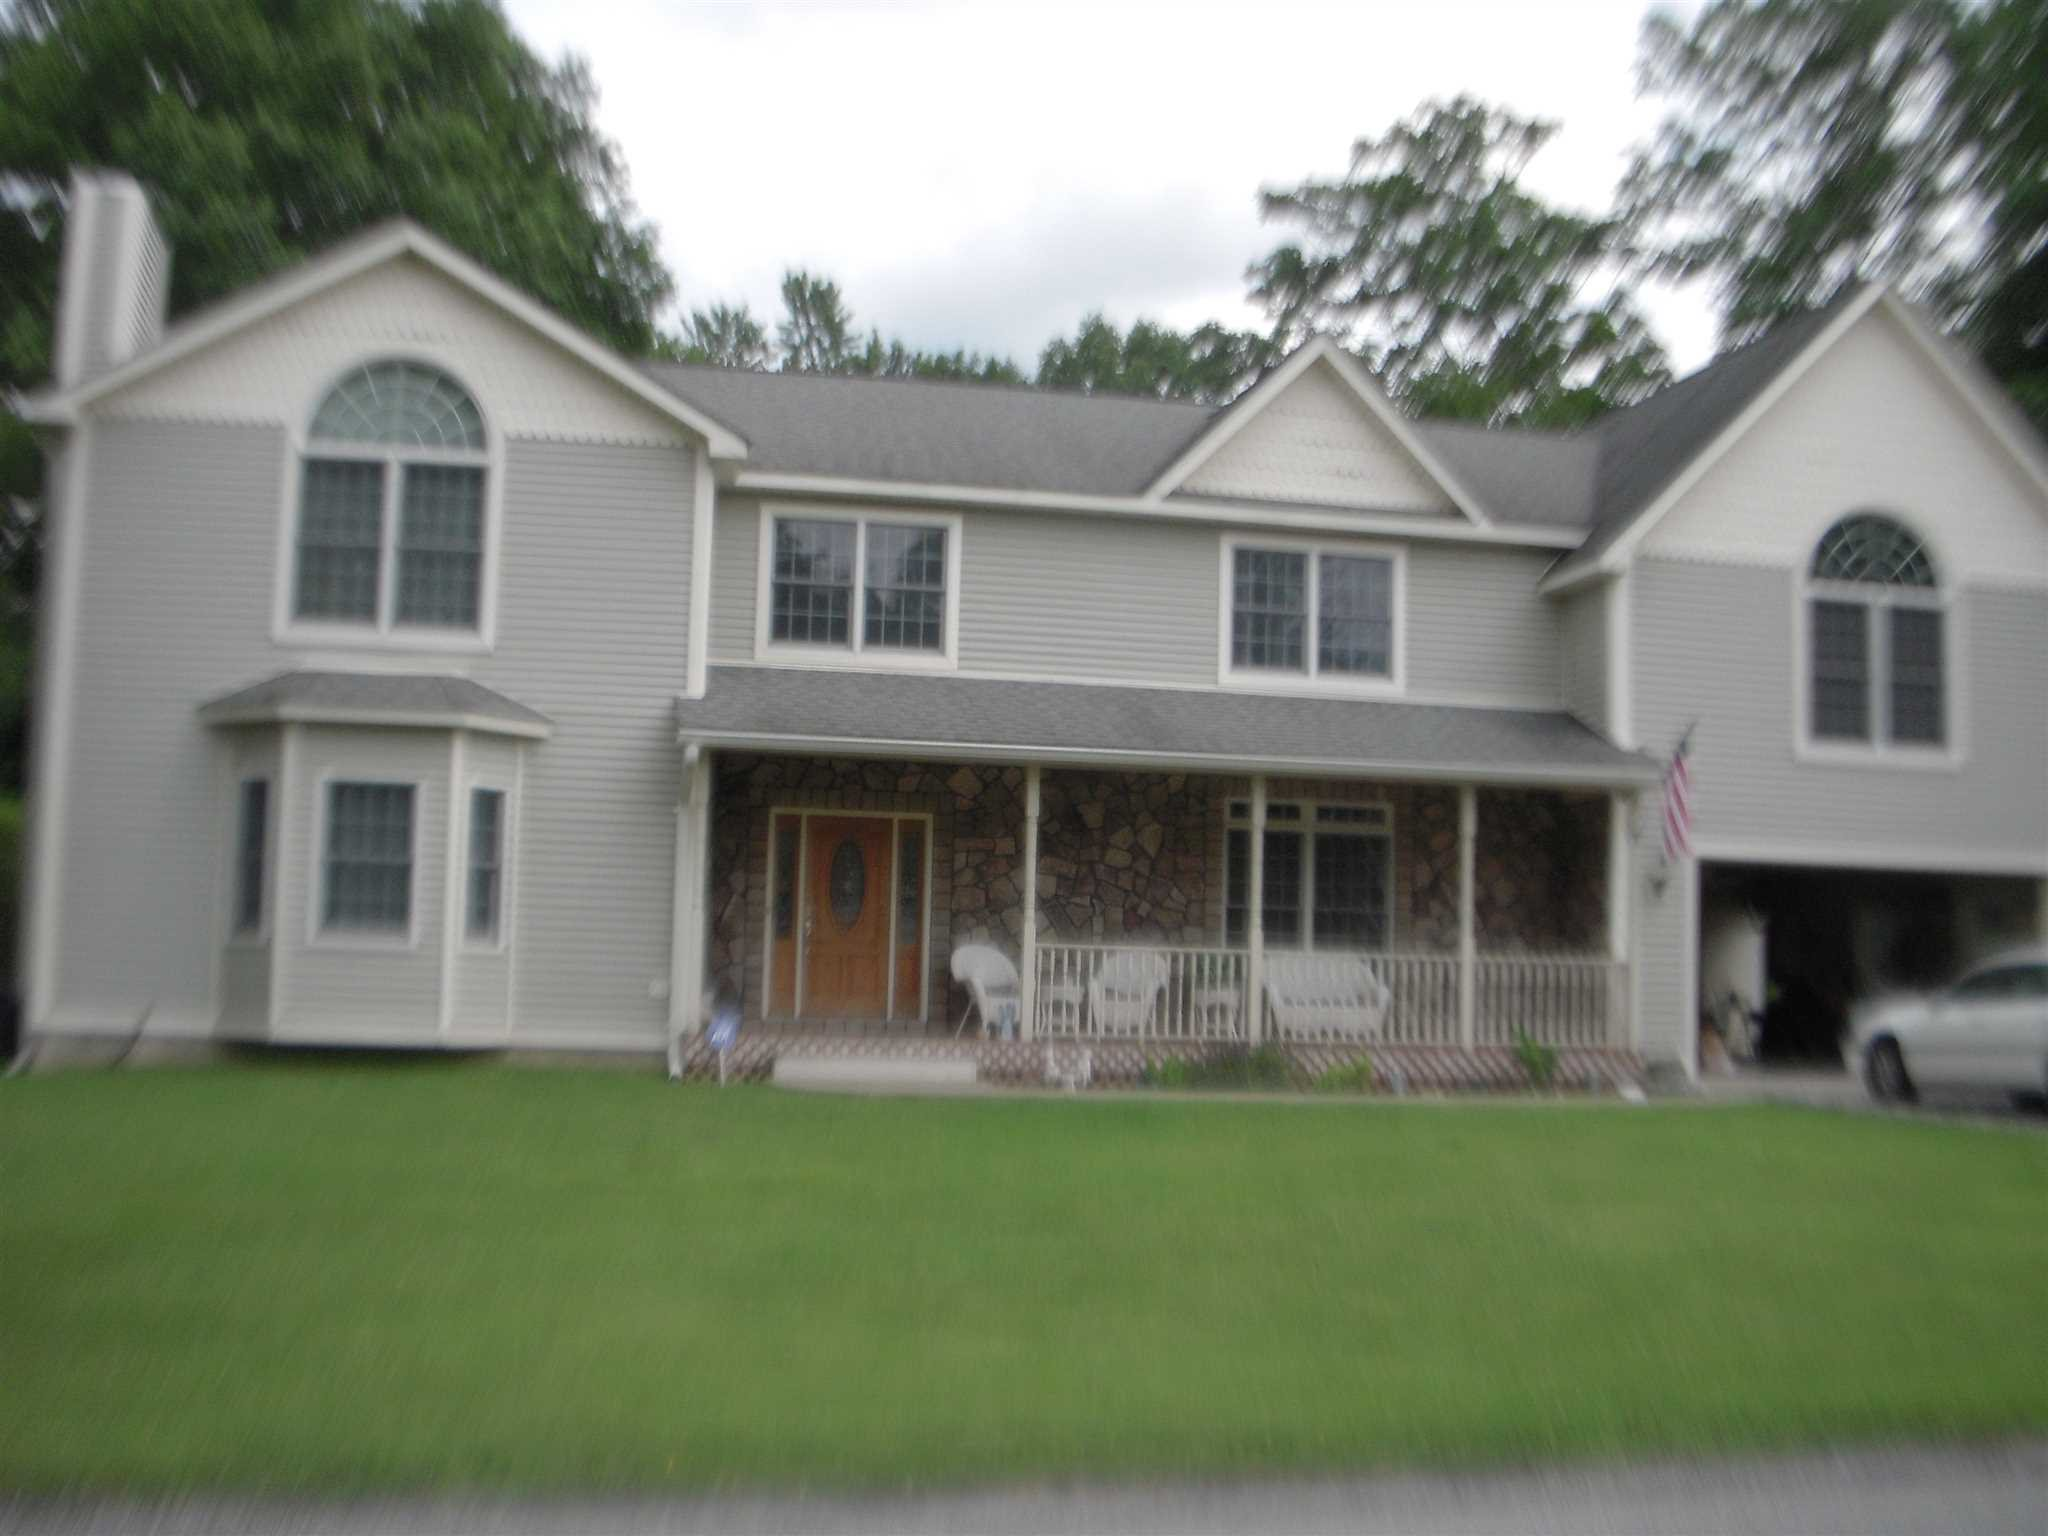 Single Family Home for Sale at 3 ANSARA Road 3 ANSARA Road Poughkeepsie, New York 12590 United States